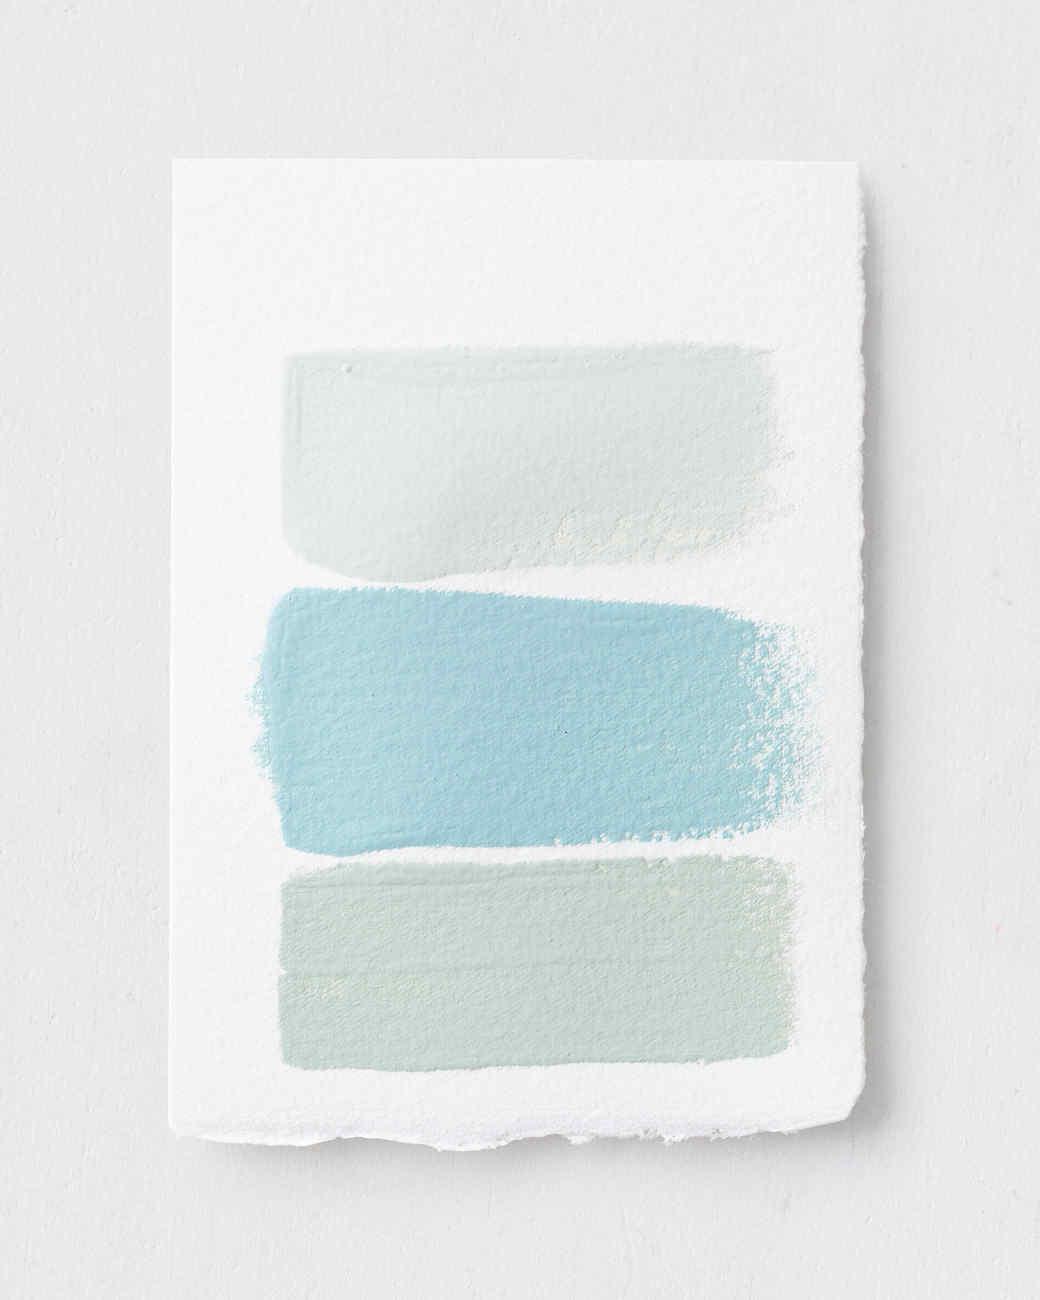 paint-swatch-david-rau-mld110837-1.jpg